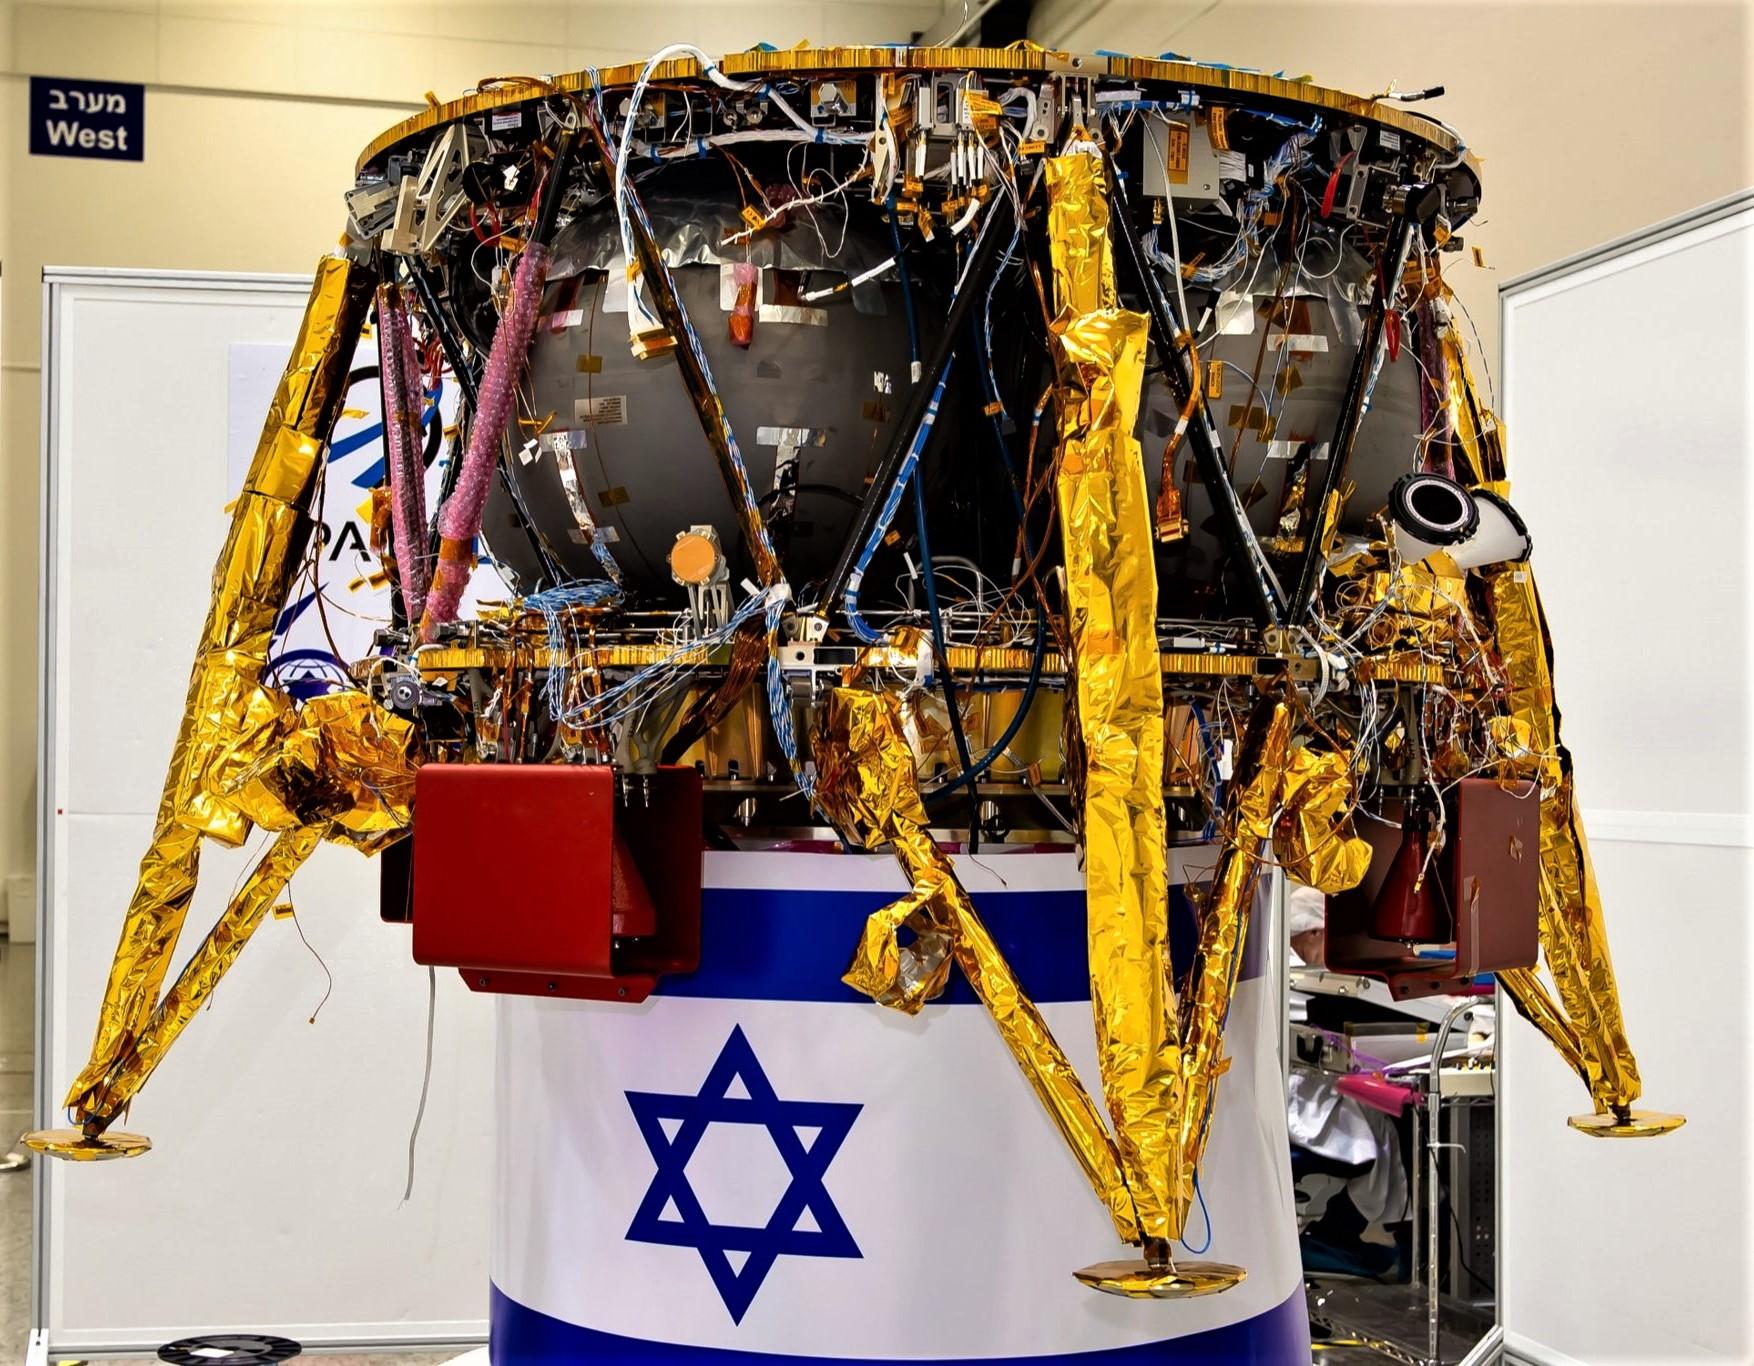 Sparrow lunar lander nears launch readiness (SpaceIL)